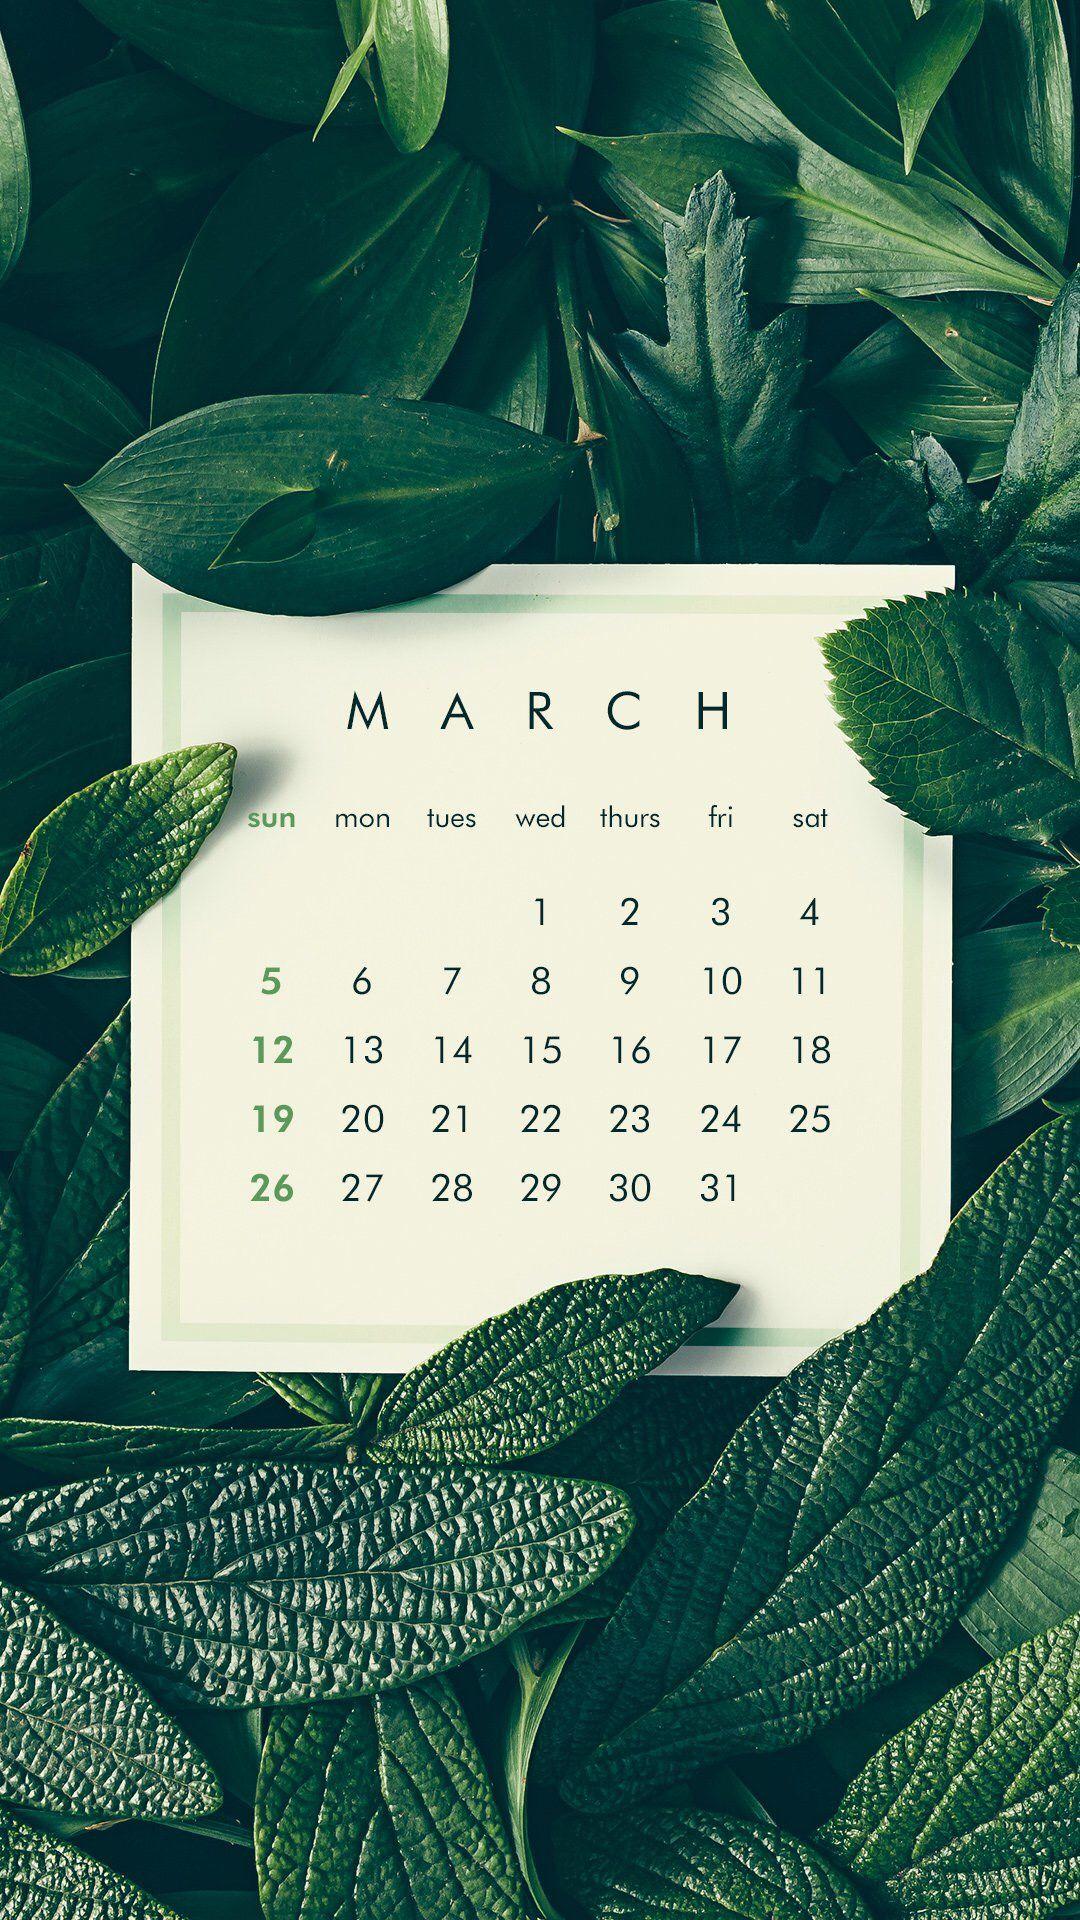 Pin By Oksana On Calendar Wallpaper Calendar Wallpaper Iphone Wallpaper Quotes Hd Wallpaper Quotes